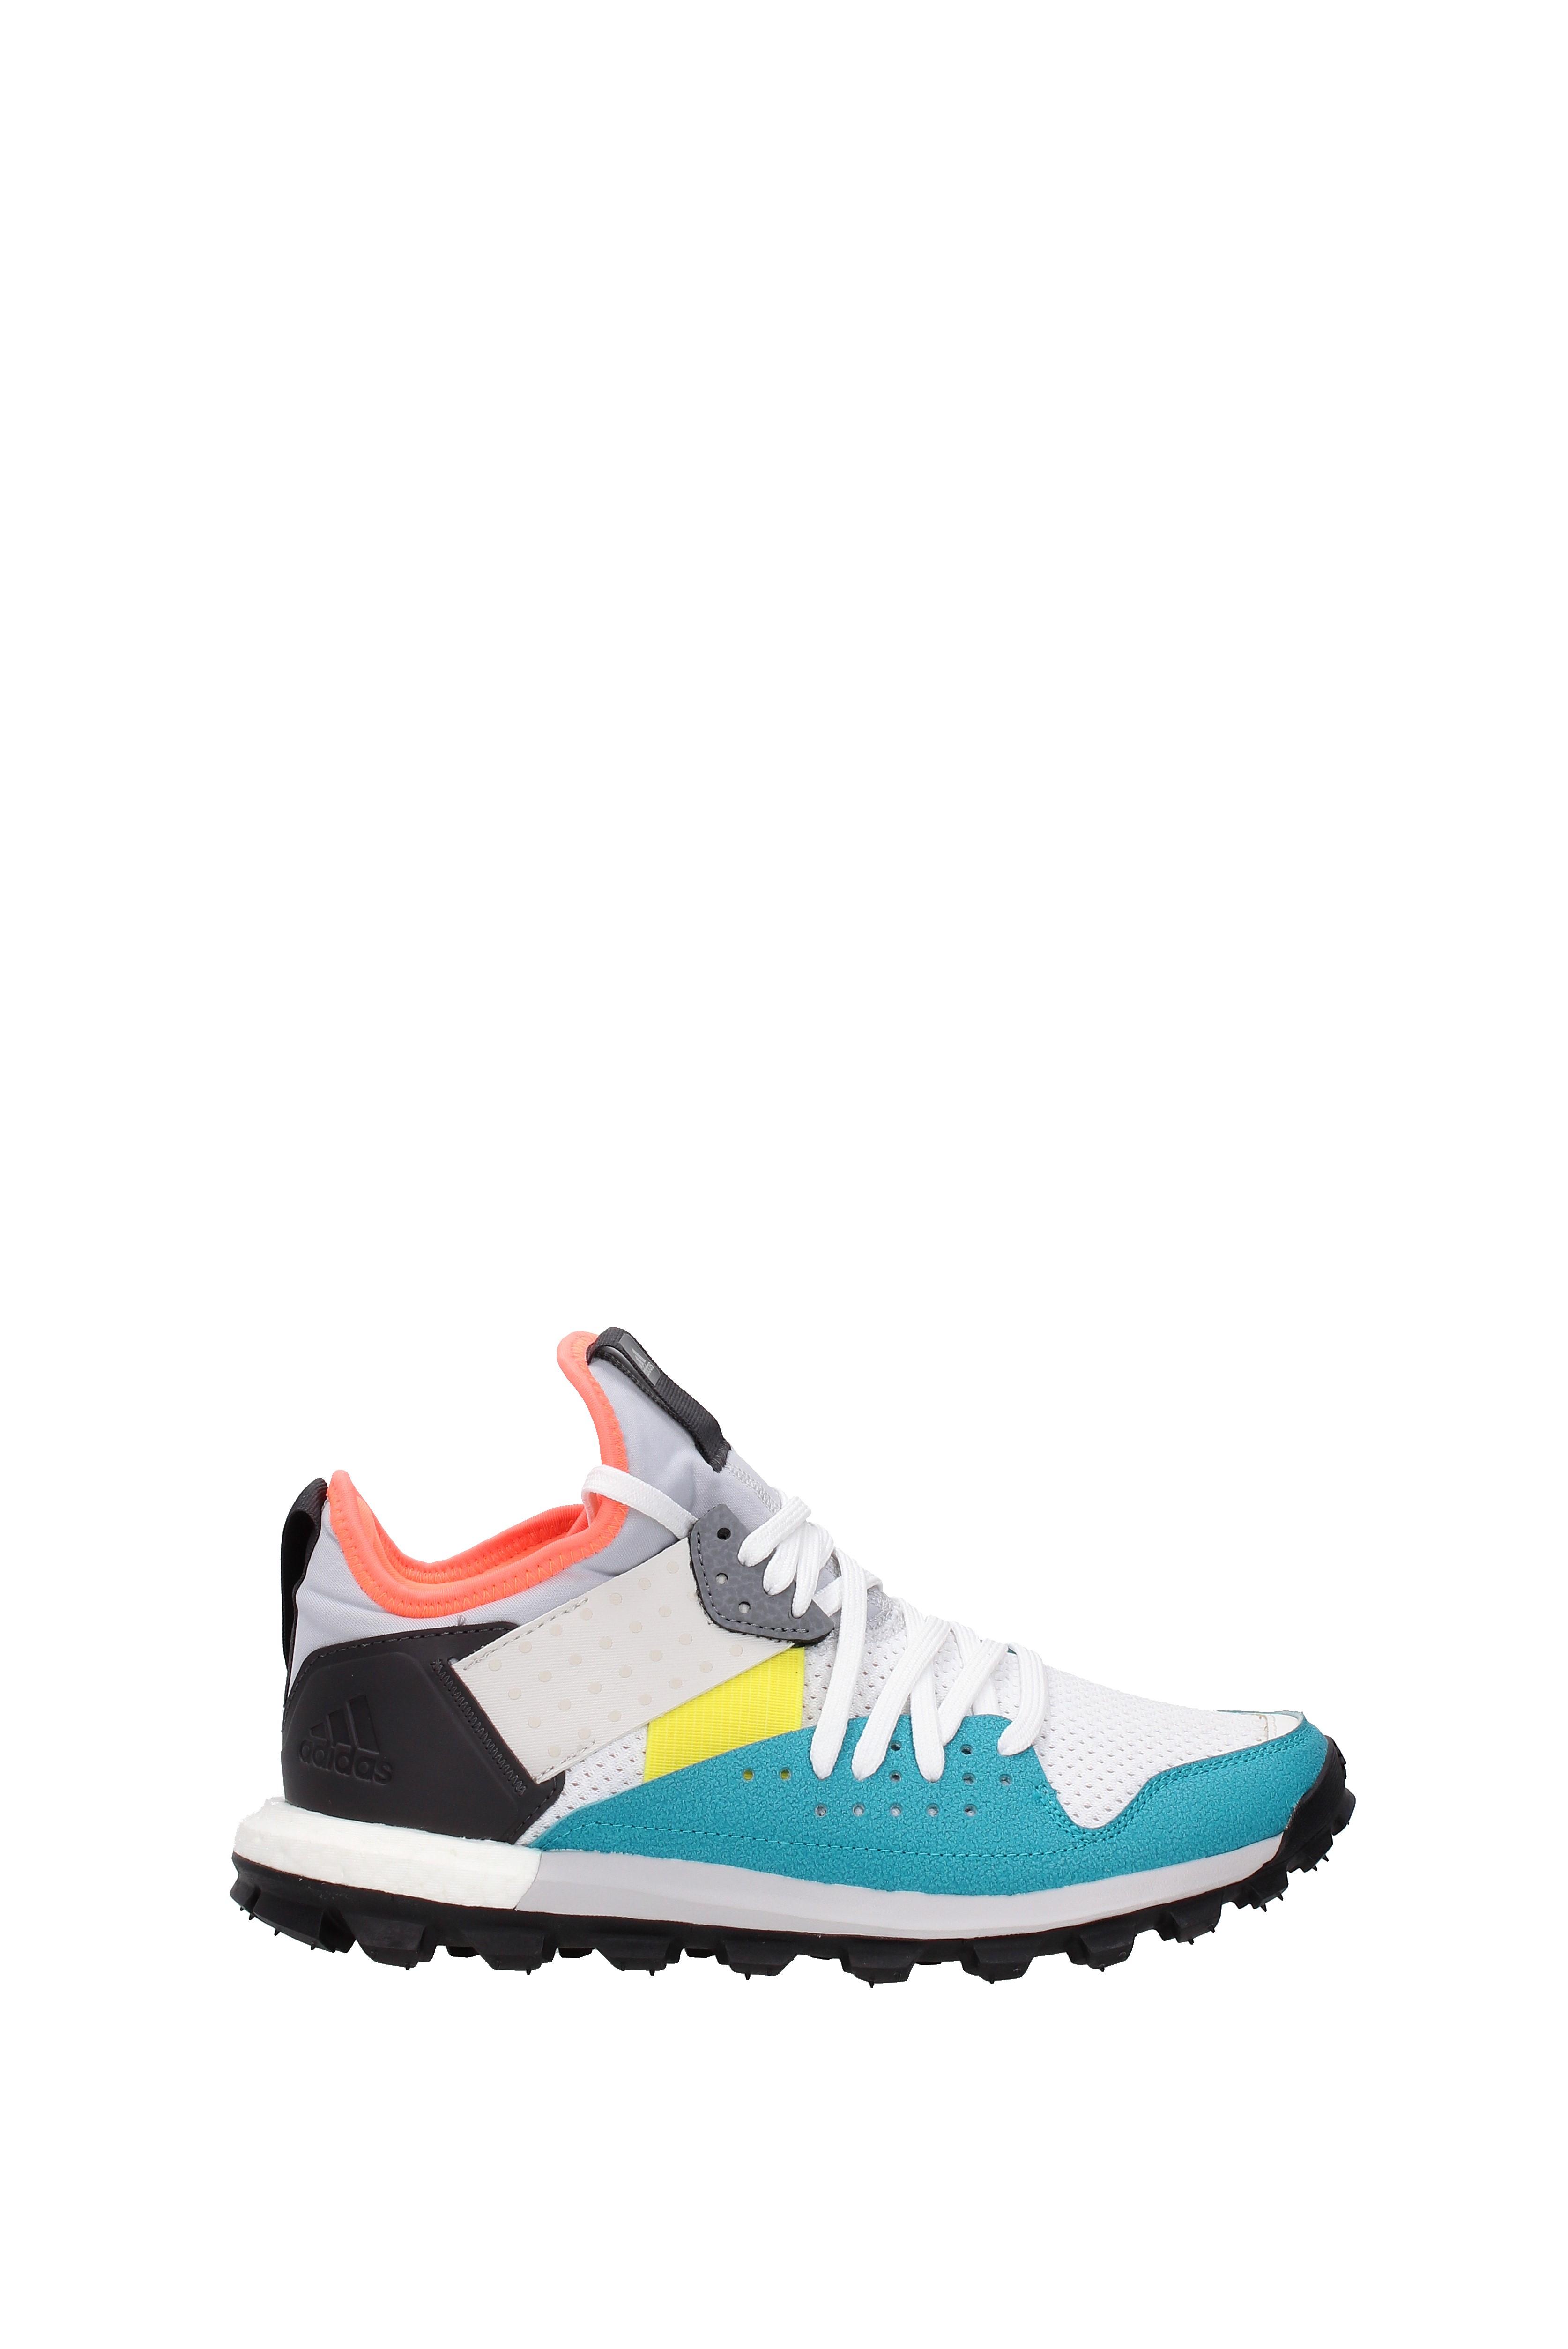 Sneakers Adidas Adidas Sneakers Herren - Stoff (RESPONSETRBY259) 1e5d9b